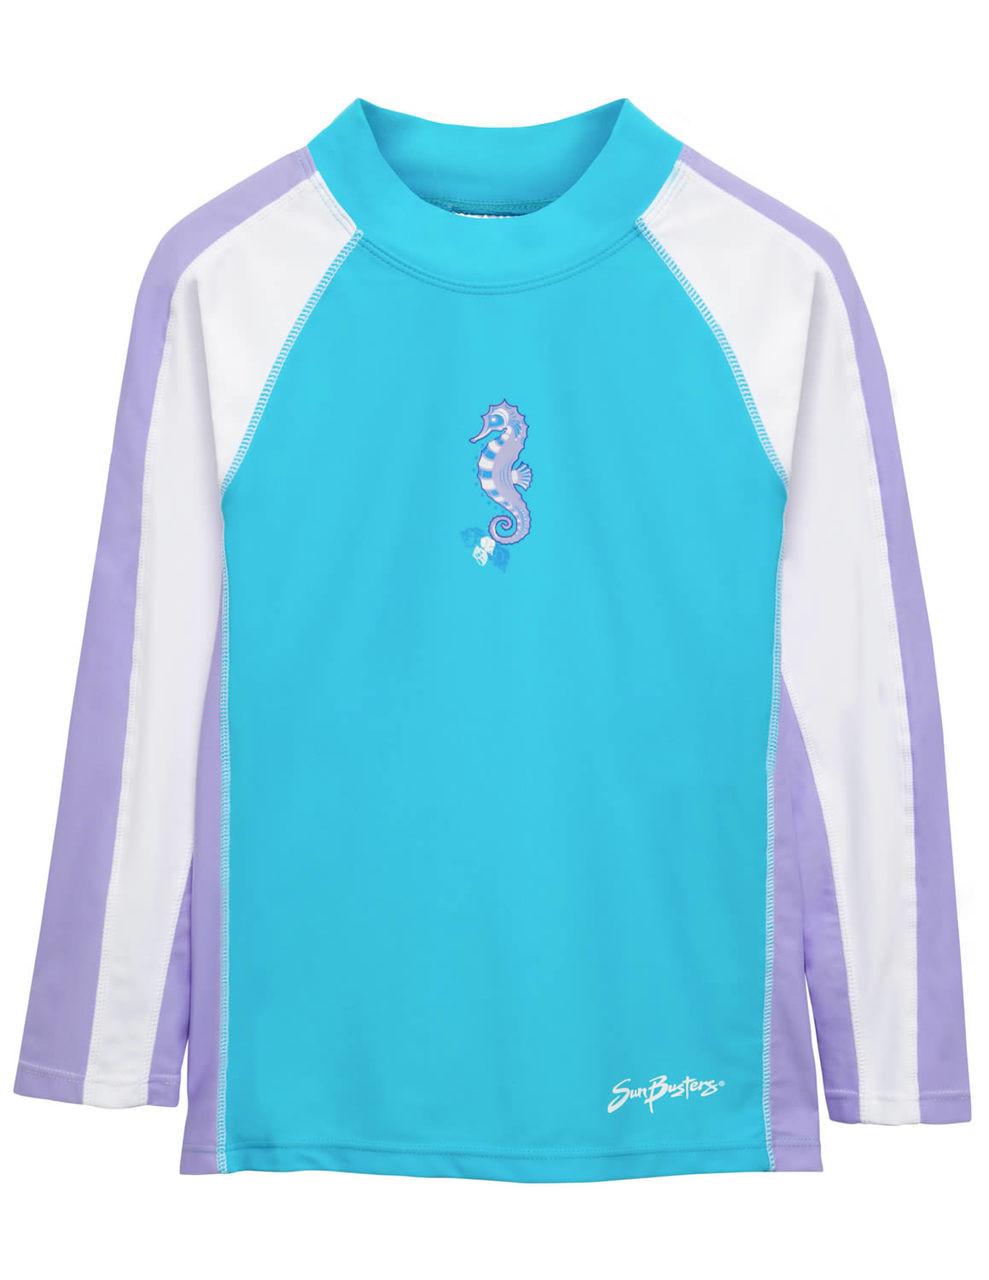 b8b8a5bc4b Girls Sun Busters L/S Rashguard Swim Shirt Maui Blue | Boys UV Clothing